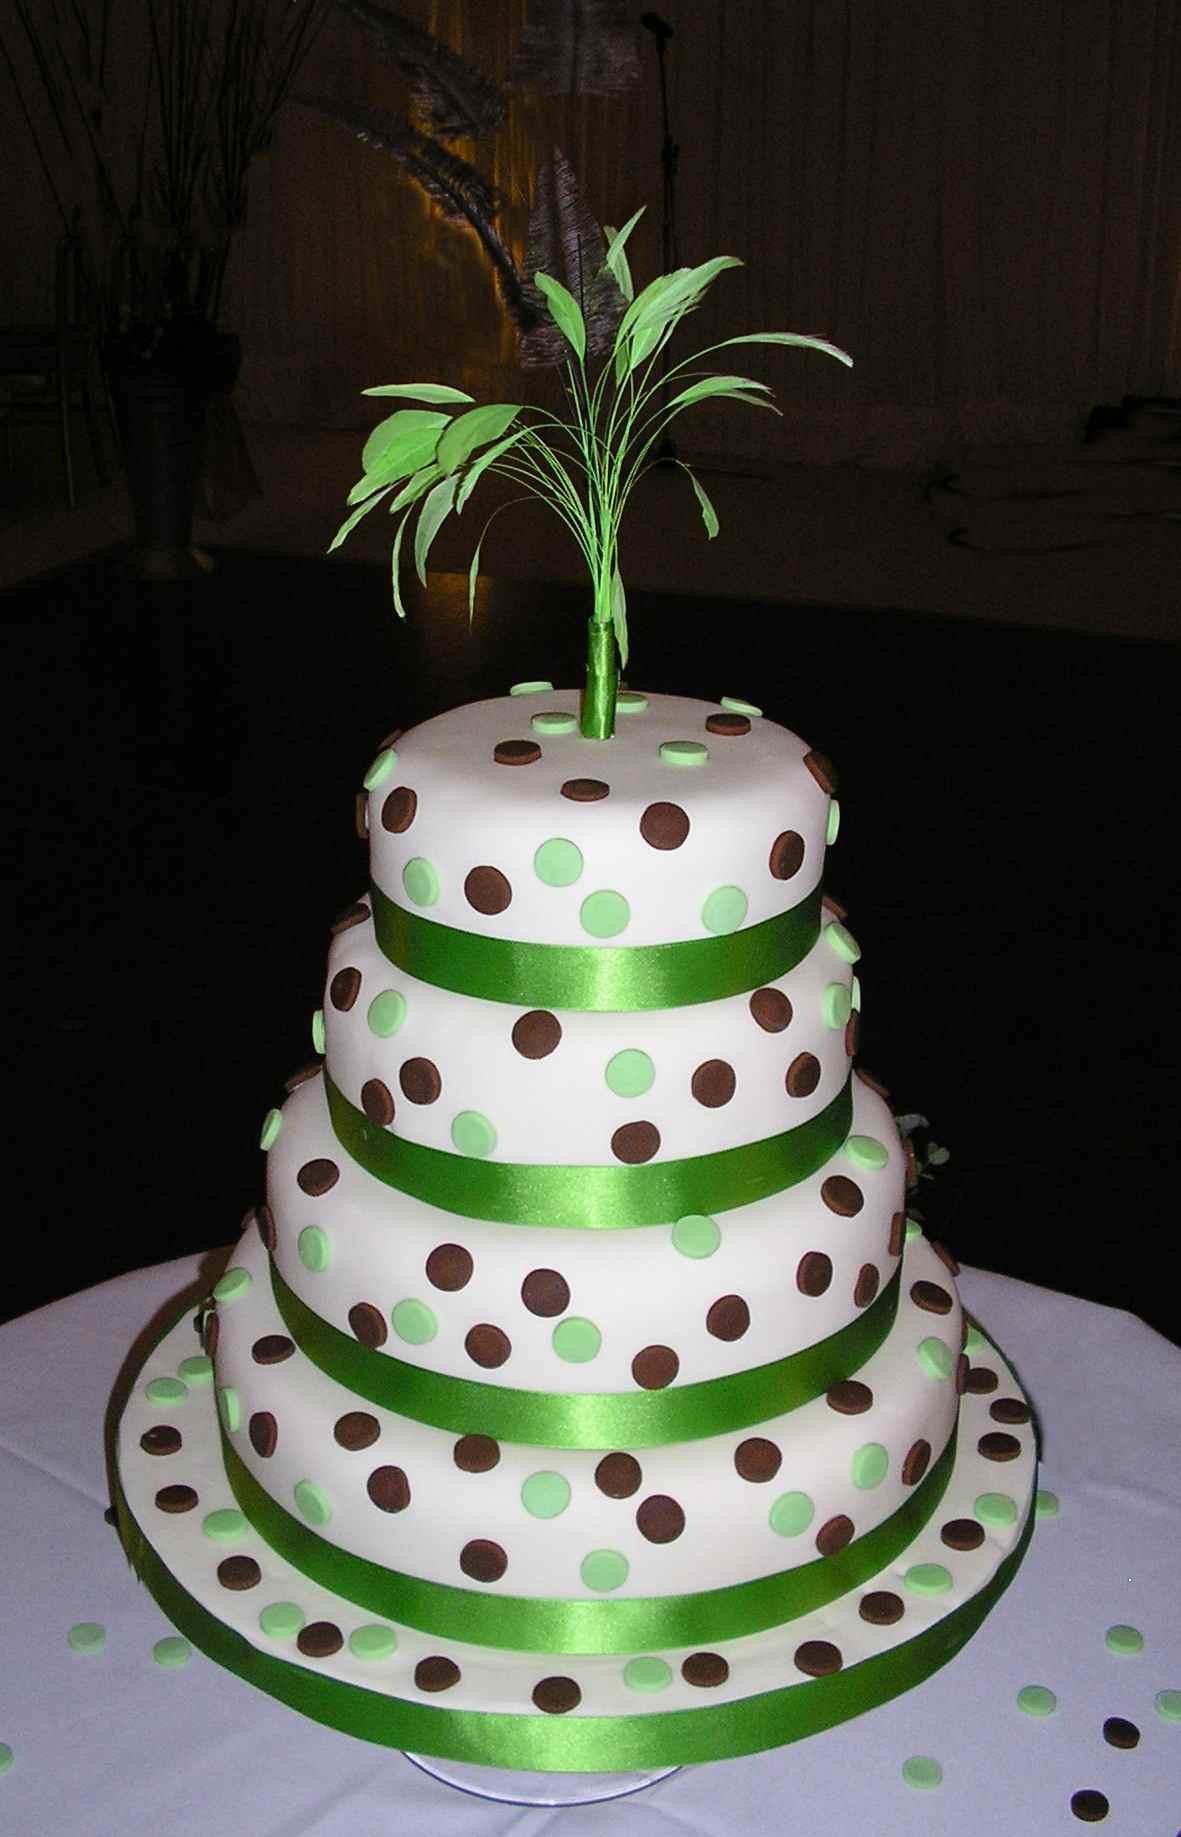 Polka Dot Cakes – Decoration Ideas